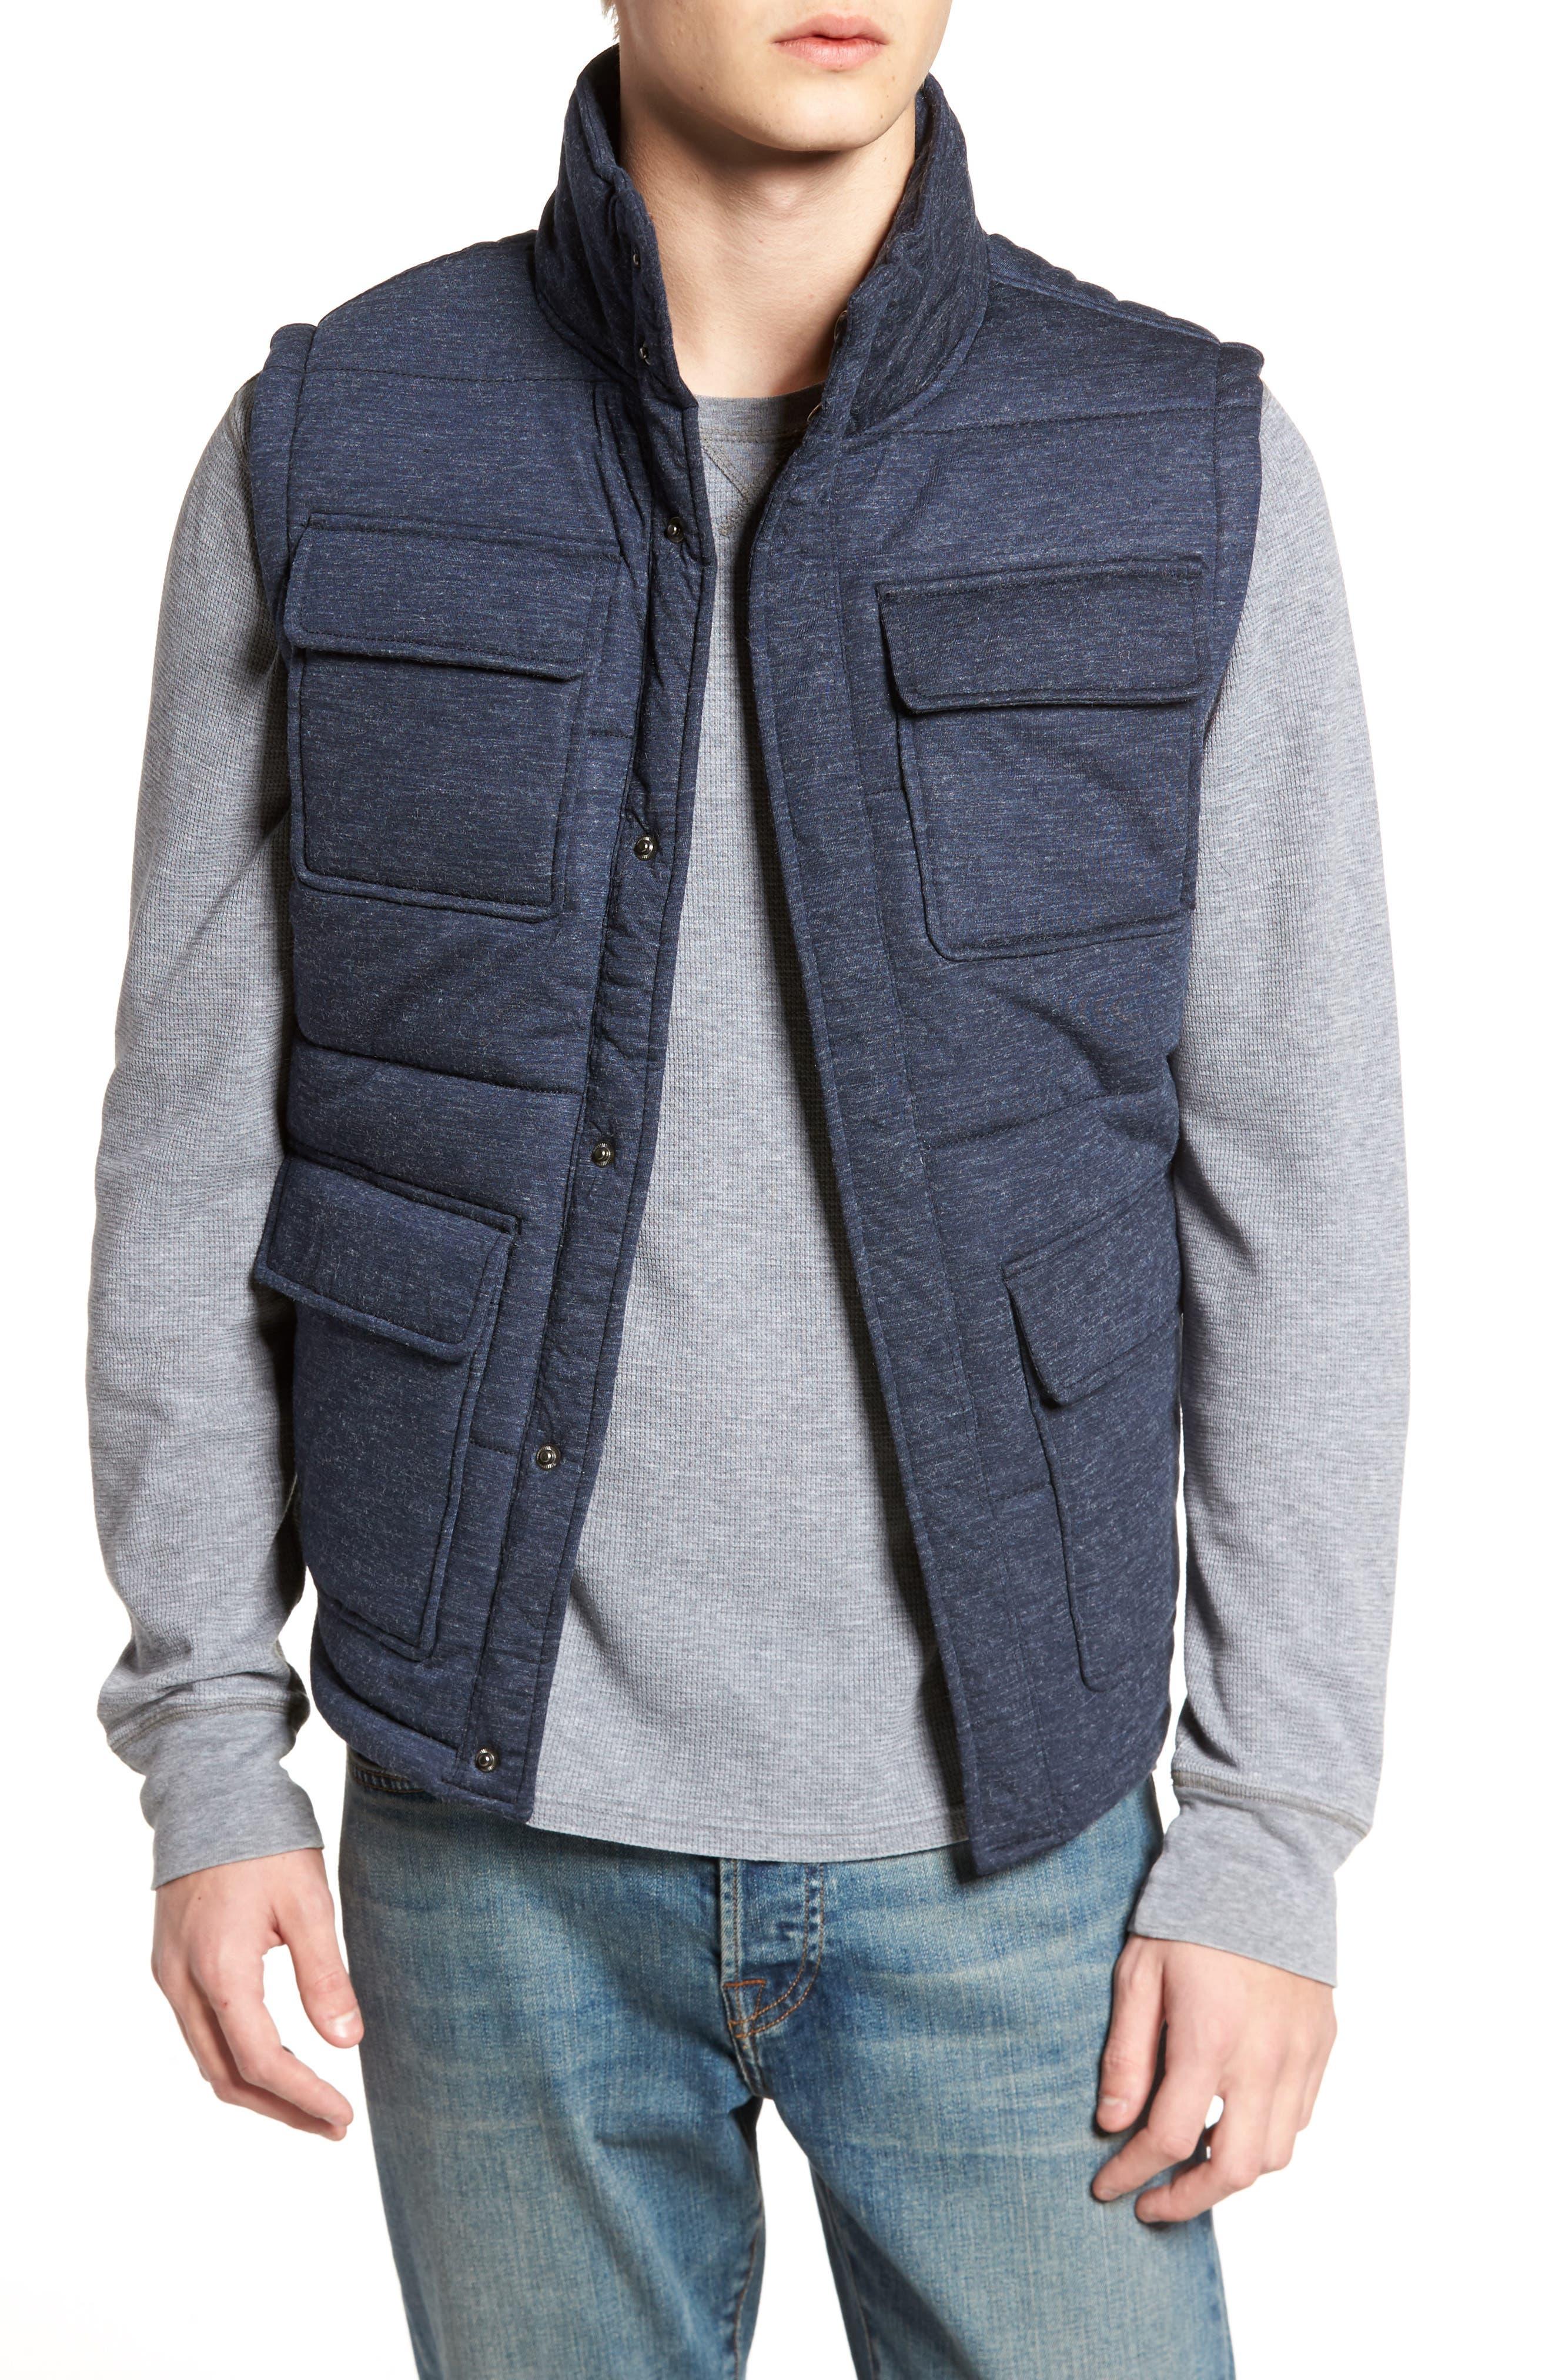 Alternate Image 1 Selected - Tunellus Four-Pocket Vest